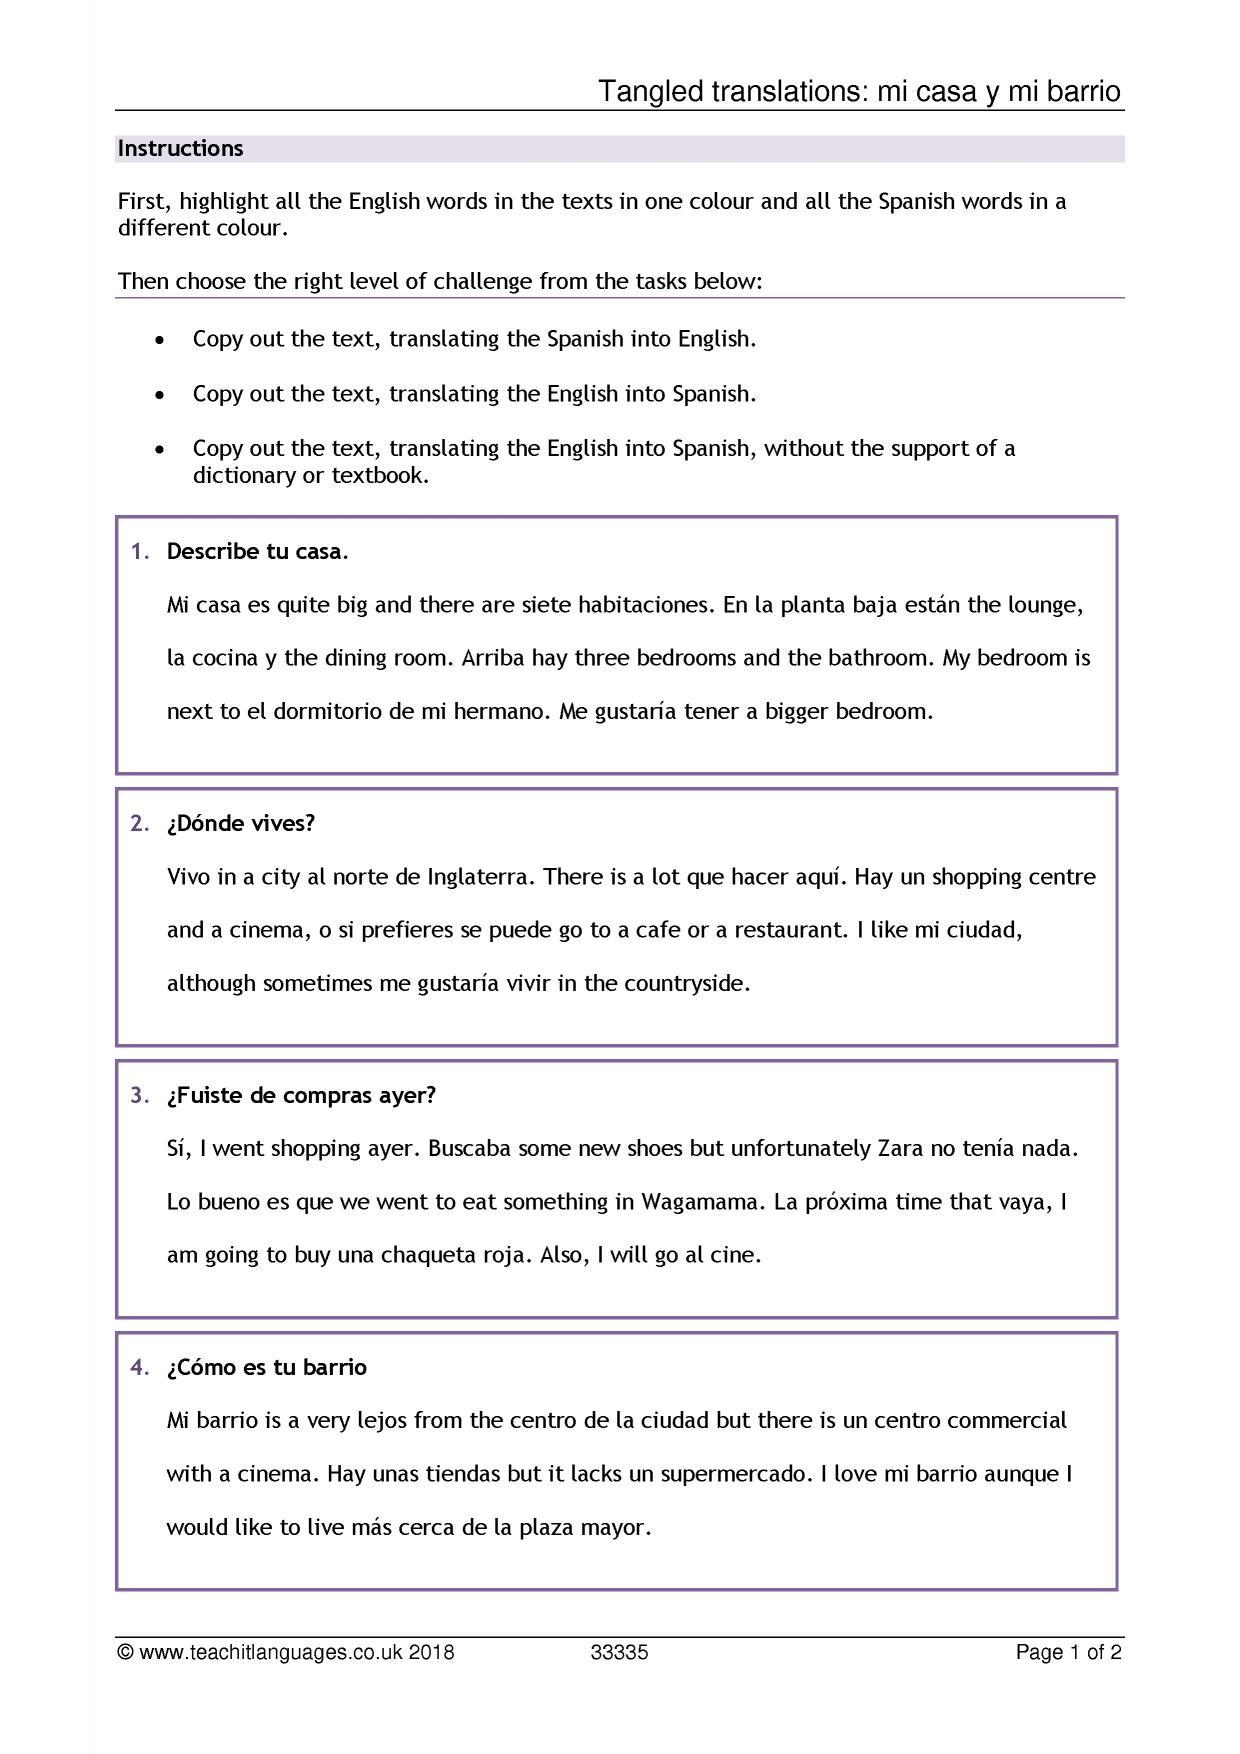 Year 7 Spanish Revision Worksheets